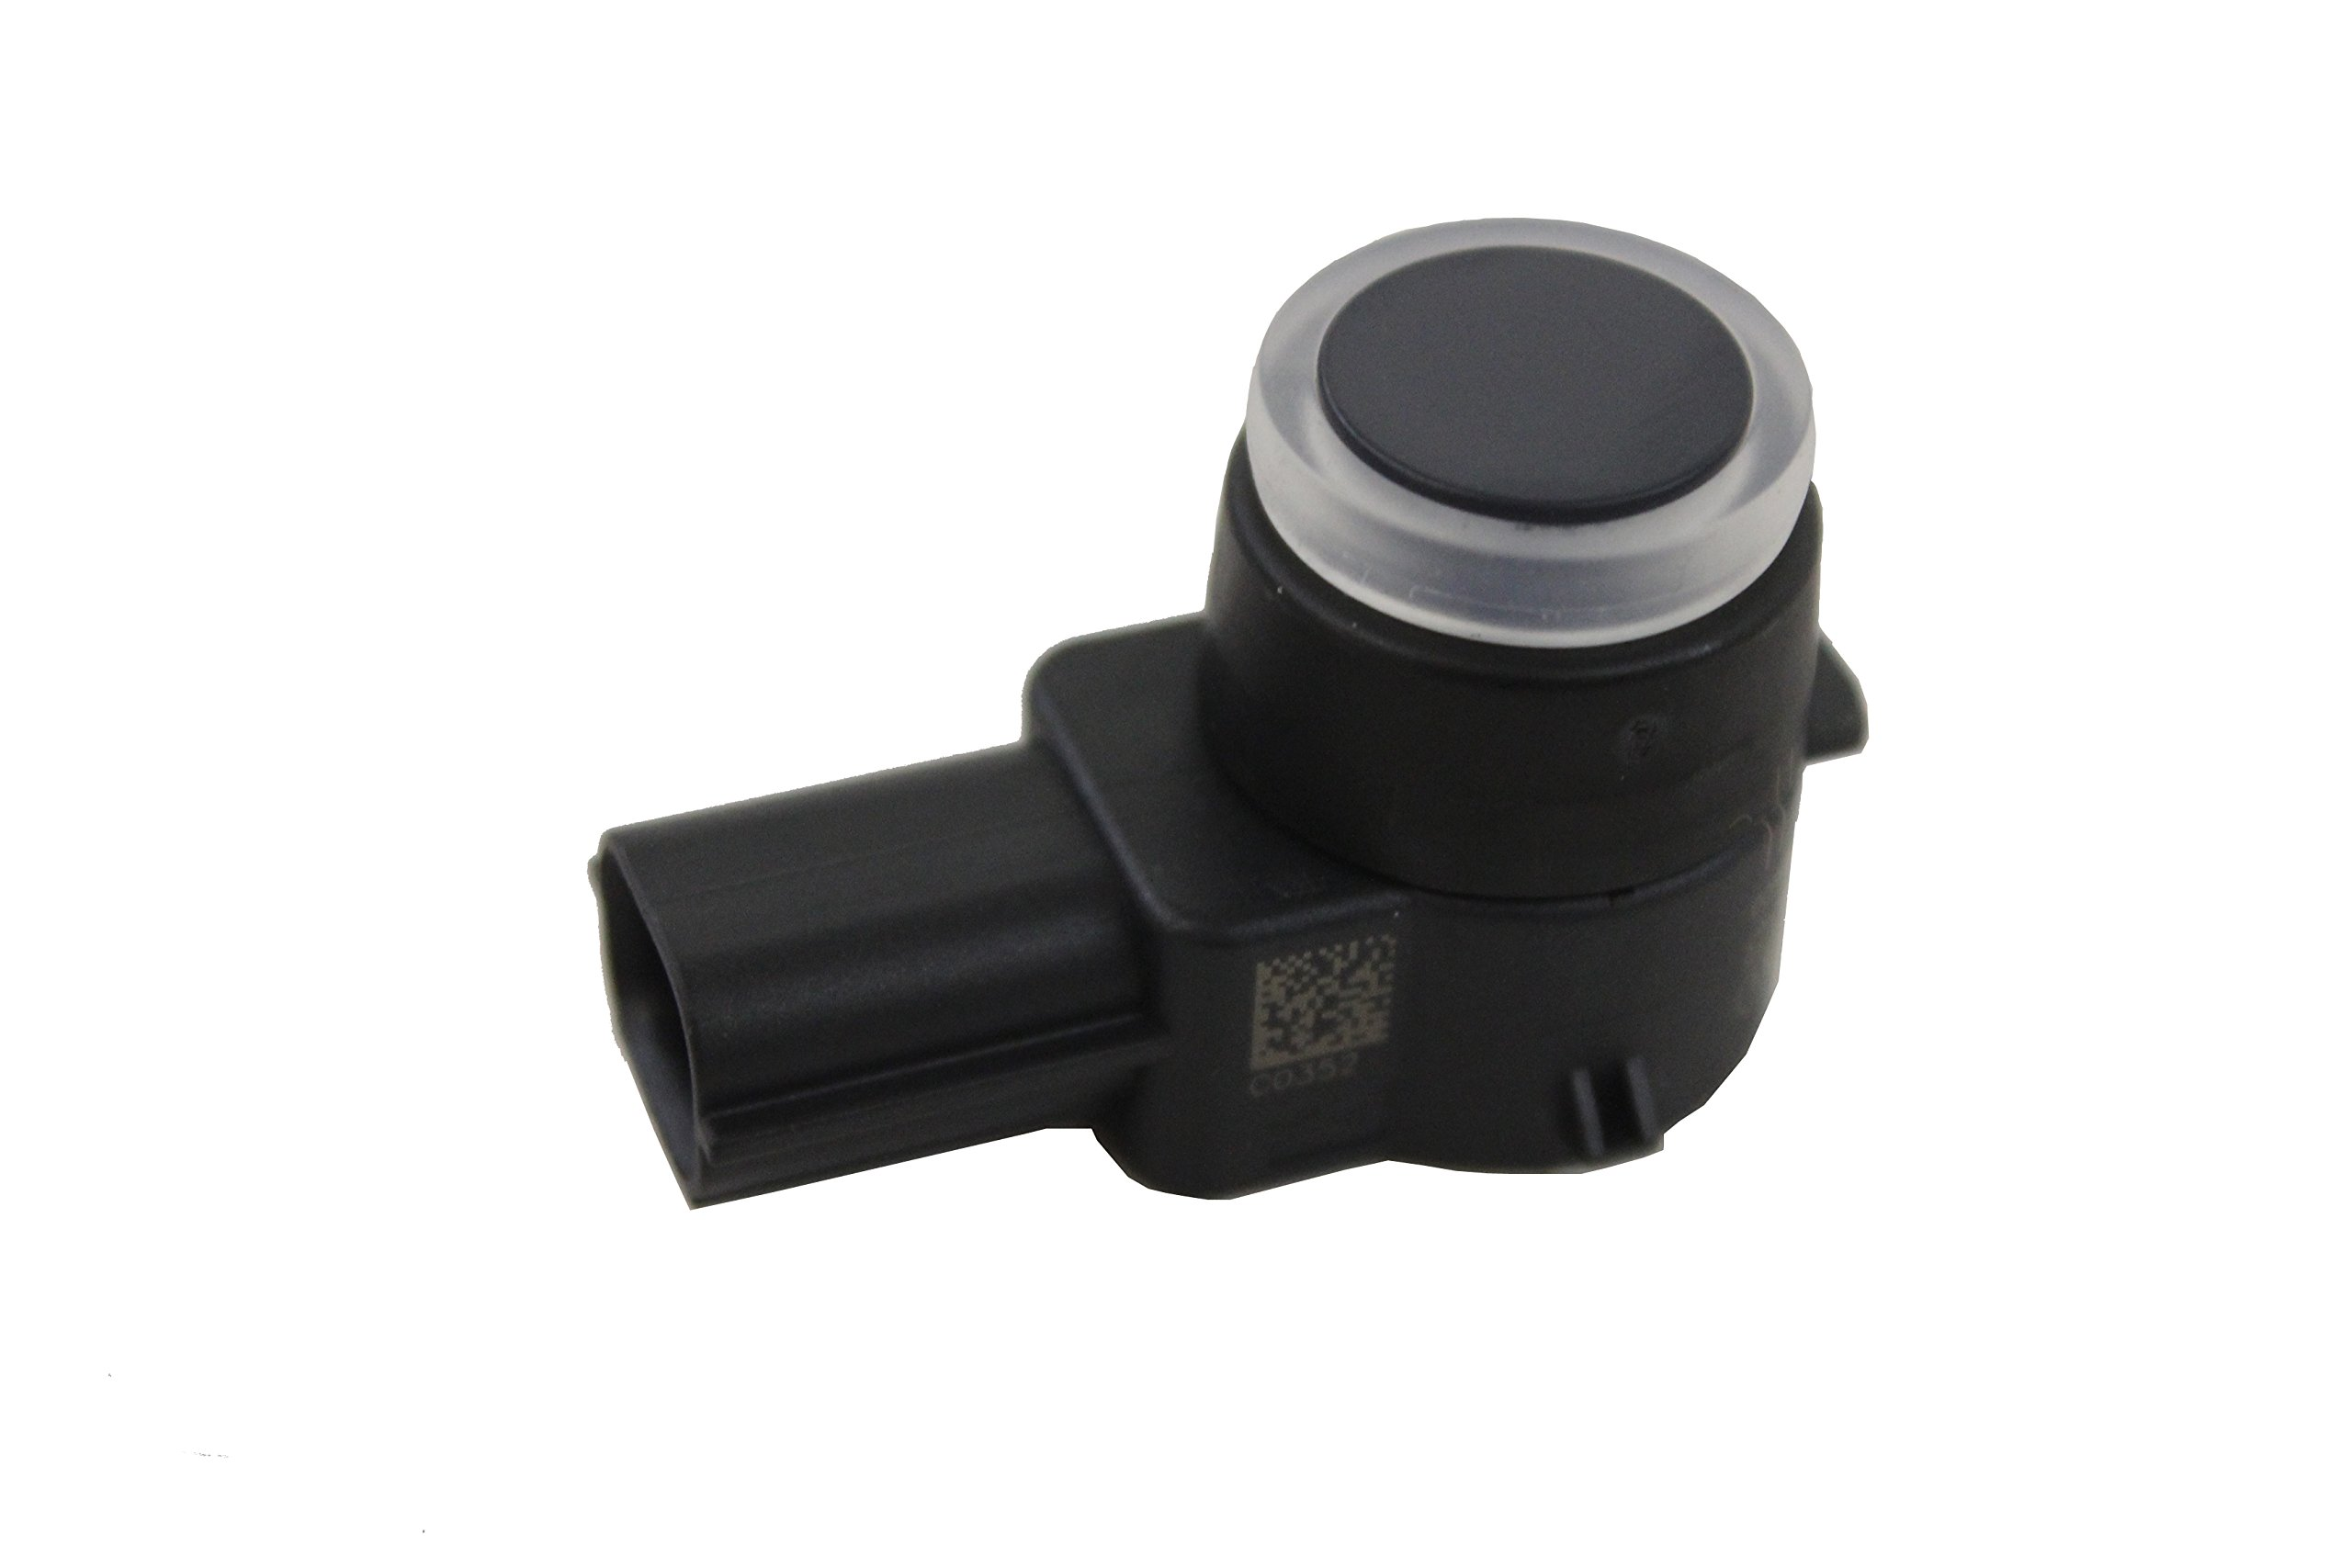 GM Genuine 20908127 Parking Assist Alarm Sensor Kit